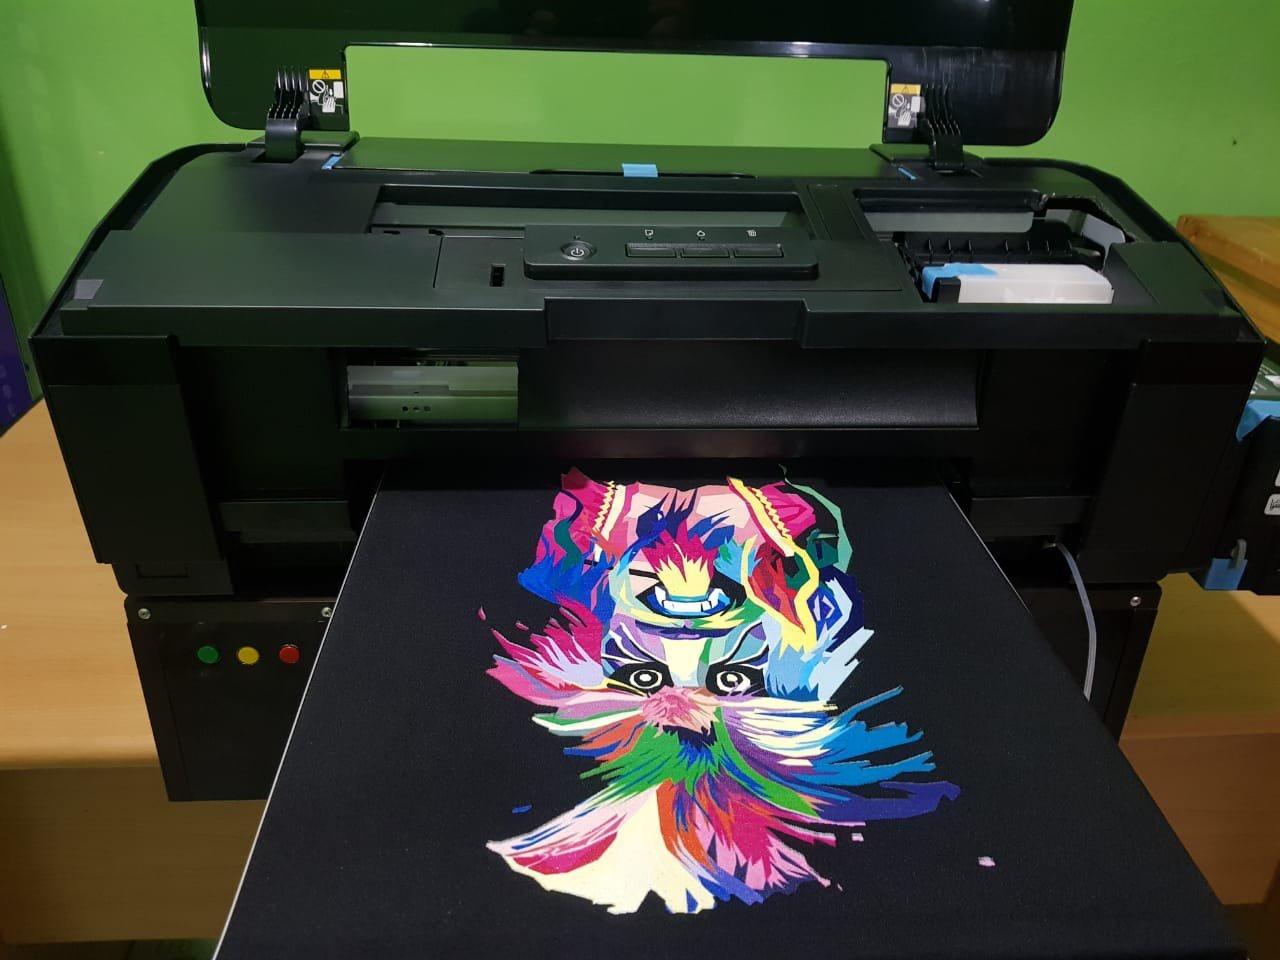 DTG Printer Epson L1800 Direct To Garment - Dark & Light T-shirt Printing